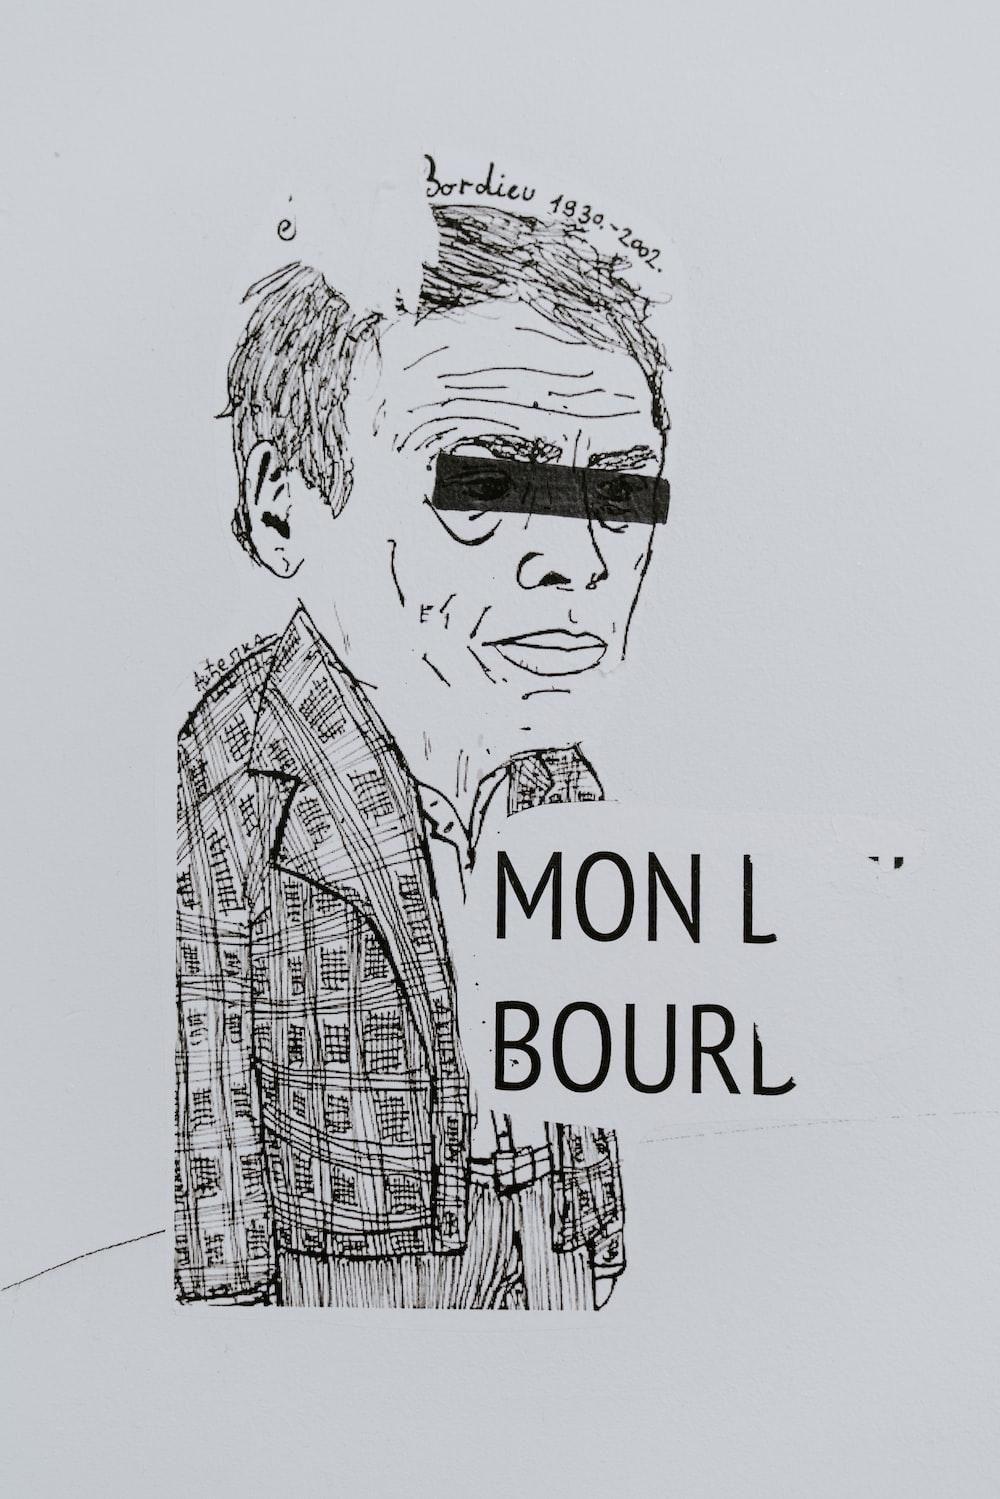 mon l bourd man cartoon drawing